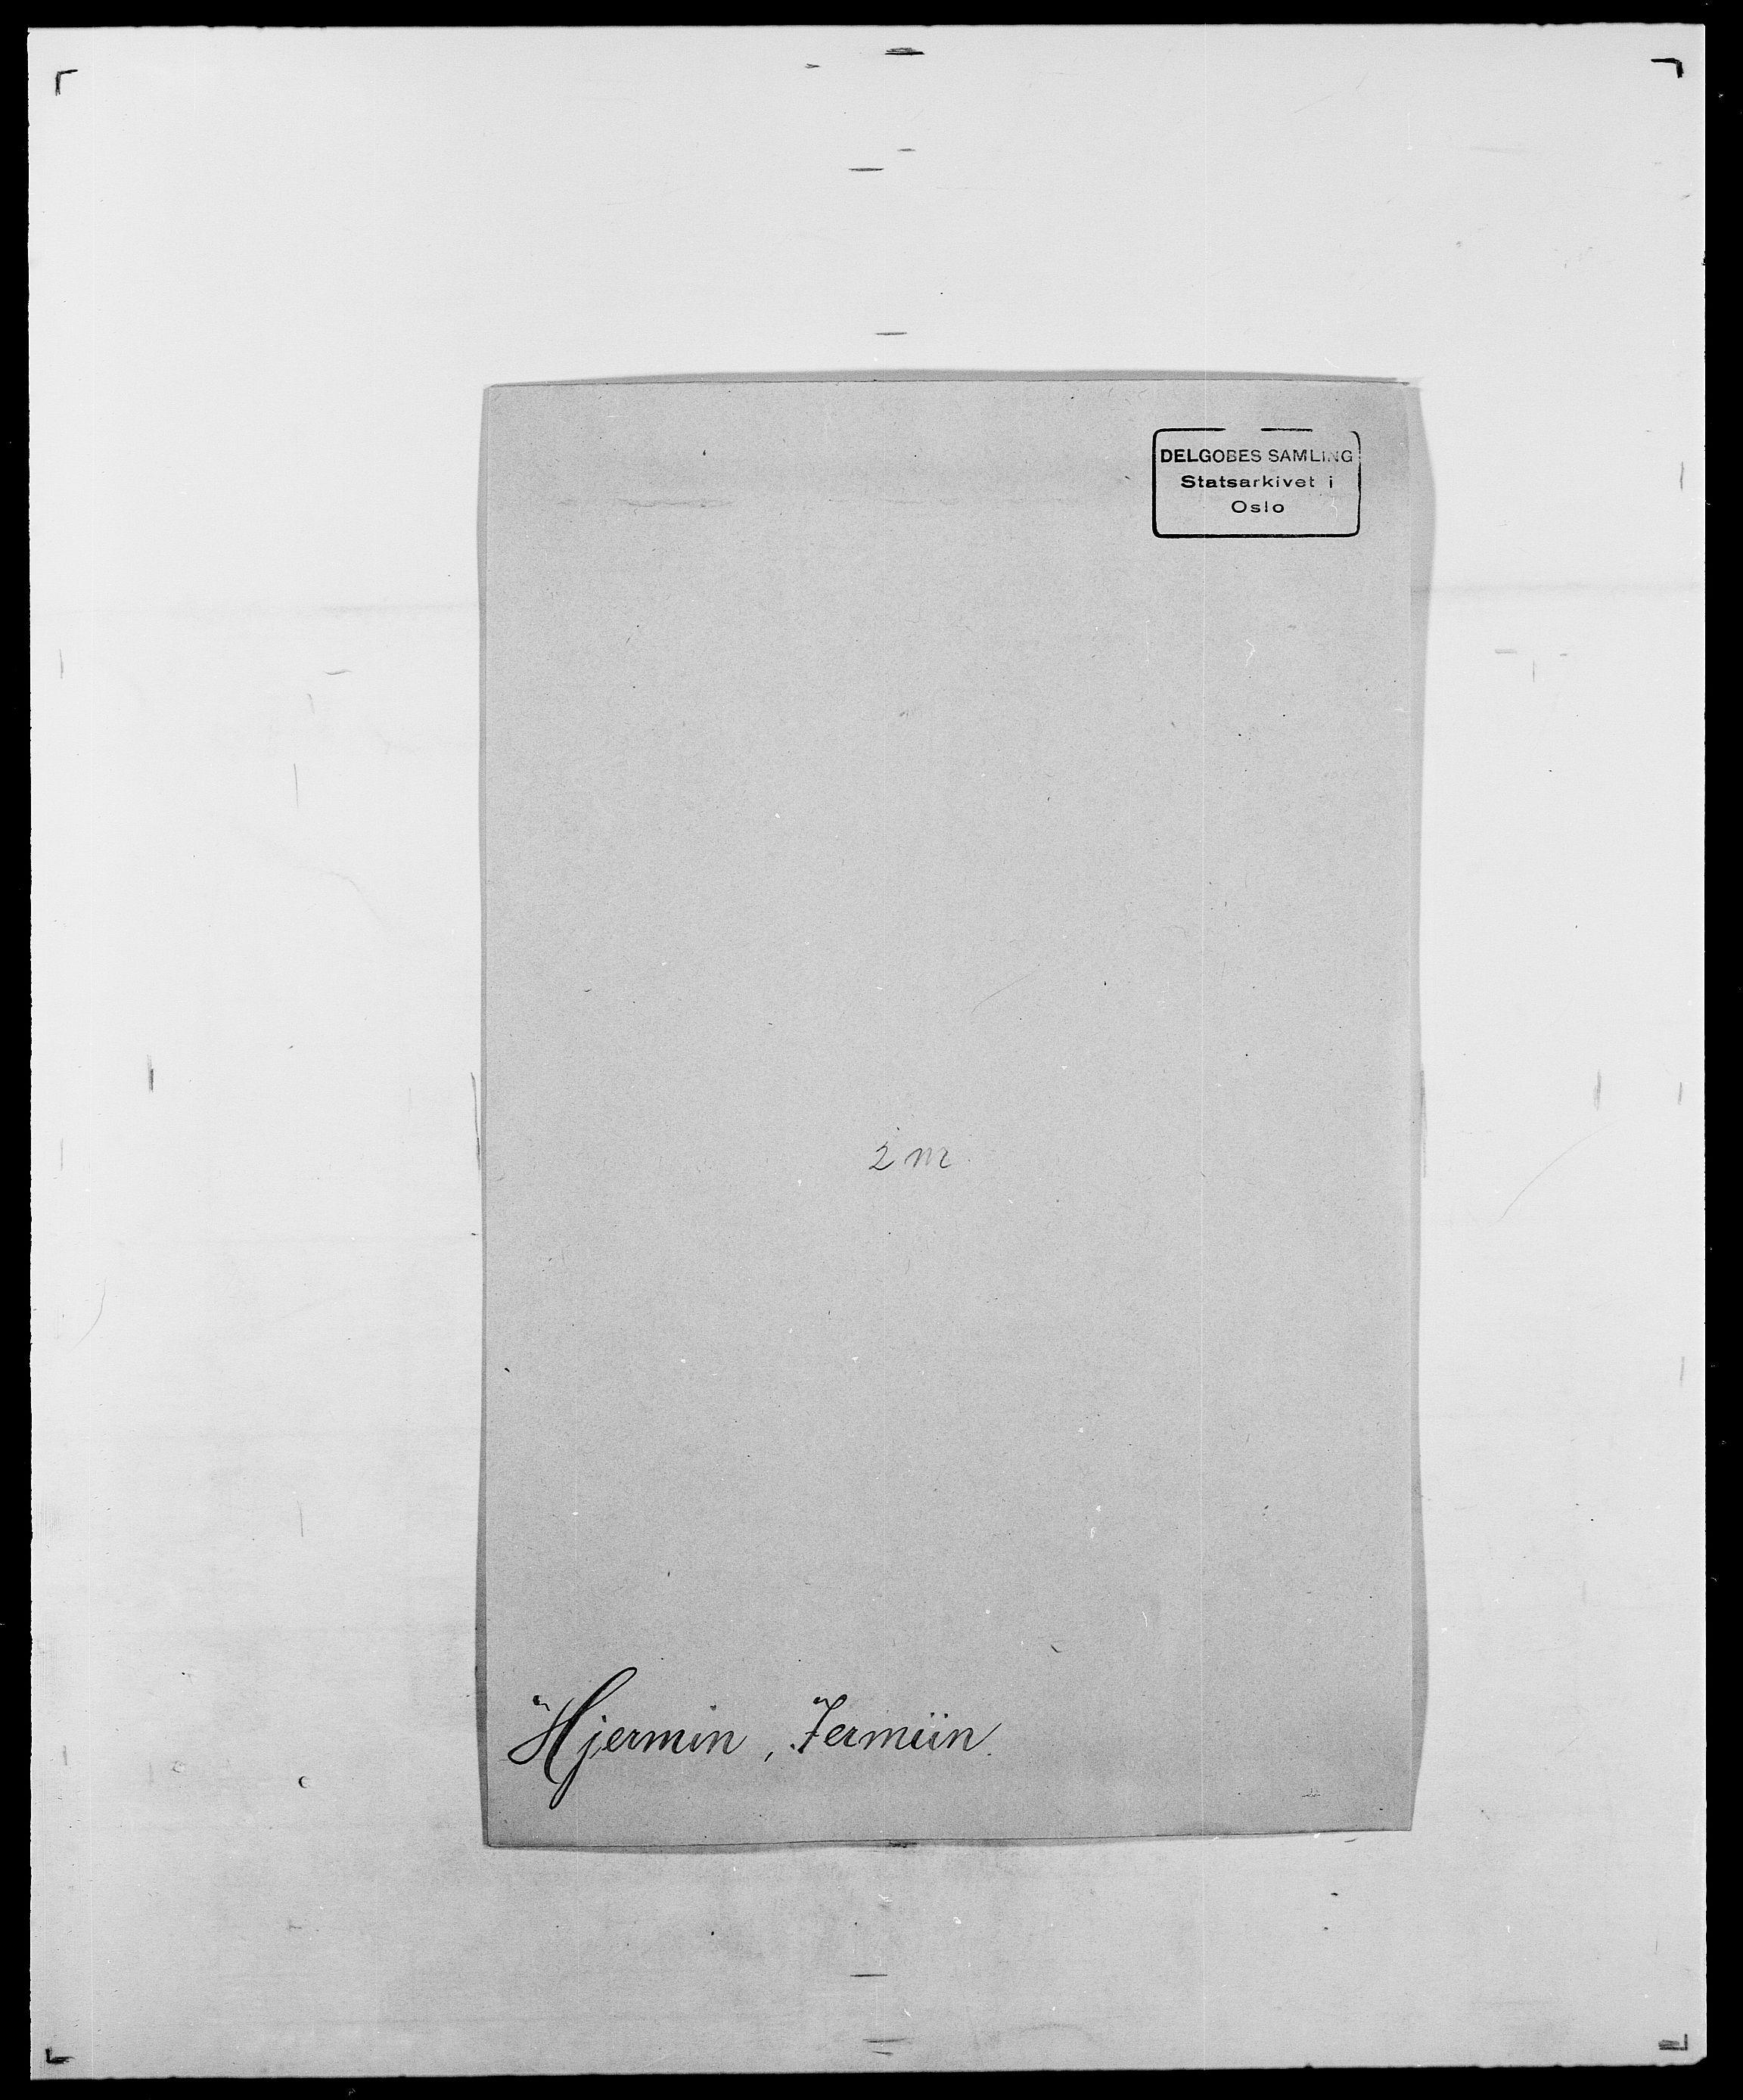 SAO, Delgobe, Charles Antoine - samling, D/Da/L0017: Helander - Hjørne, s. 555